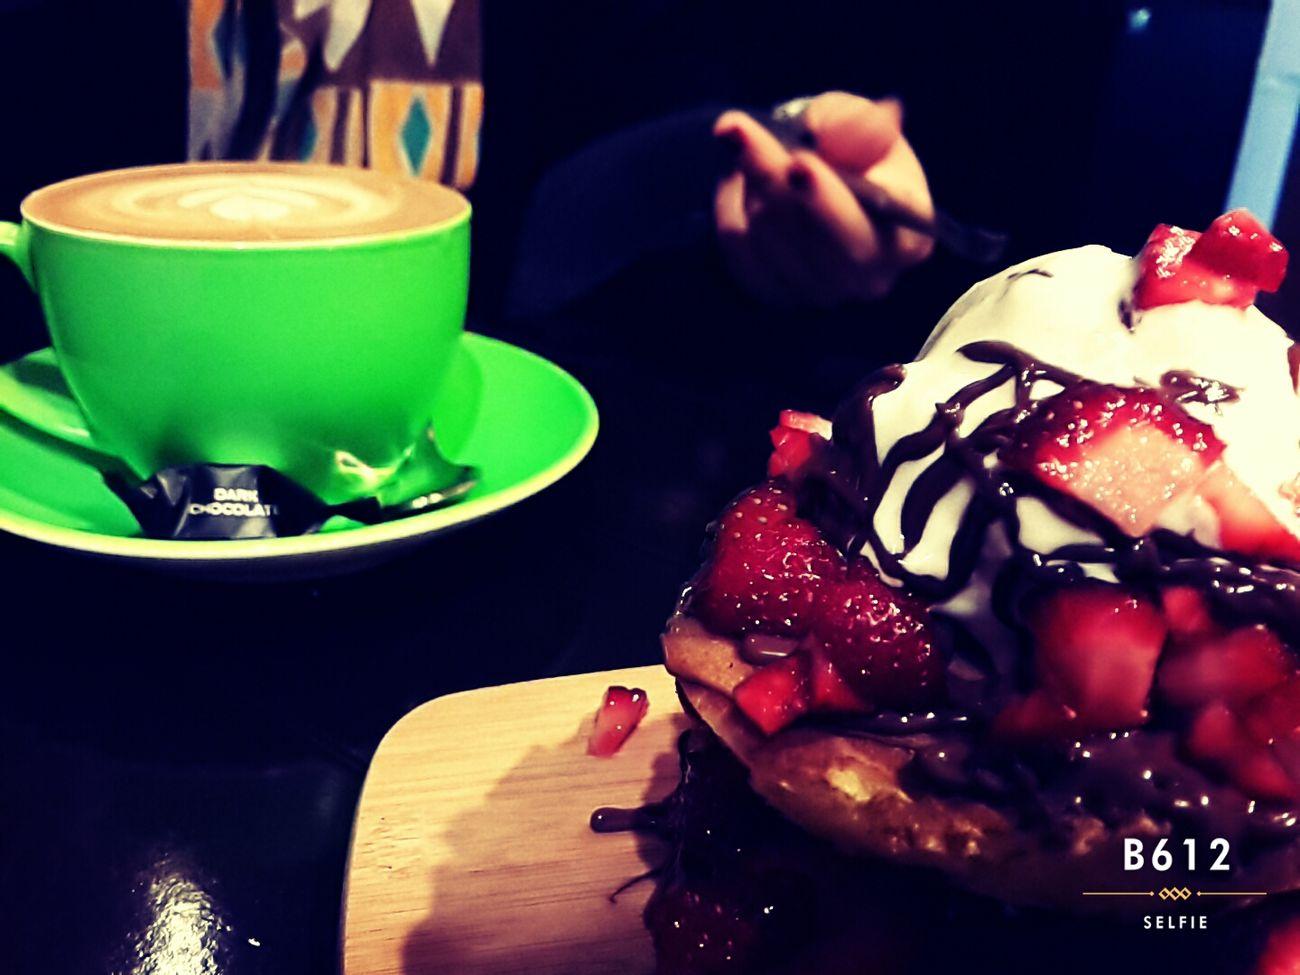 💙🌹Pancakes Green Latte Tea Cafe Time Coffee Shop Friendship Photography Mono Colorful EyeEm Best Shots Enjoying Life Nastaran Spring2015 Samsungphotography Popular EyeEm Gallery